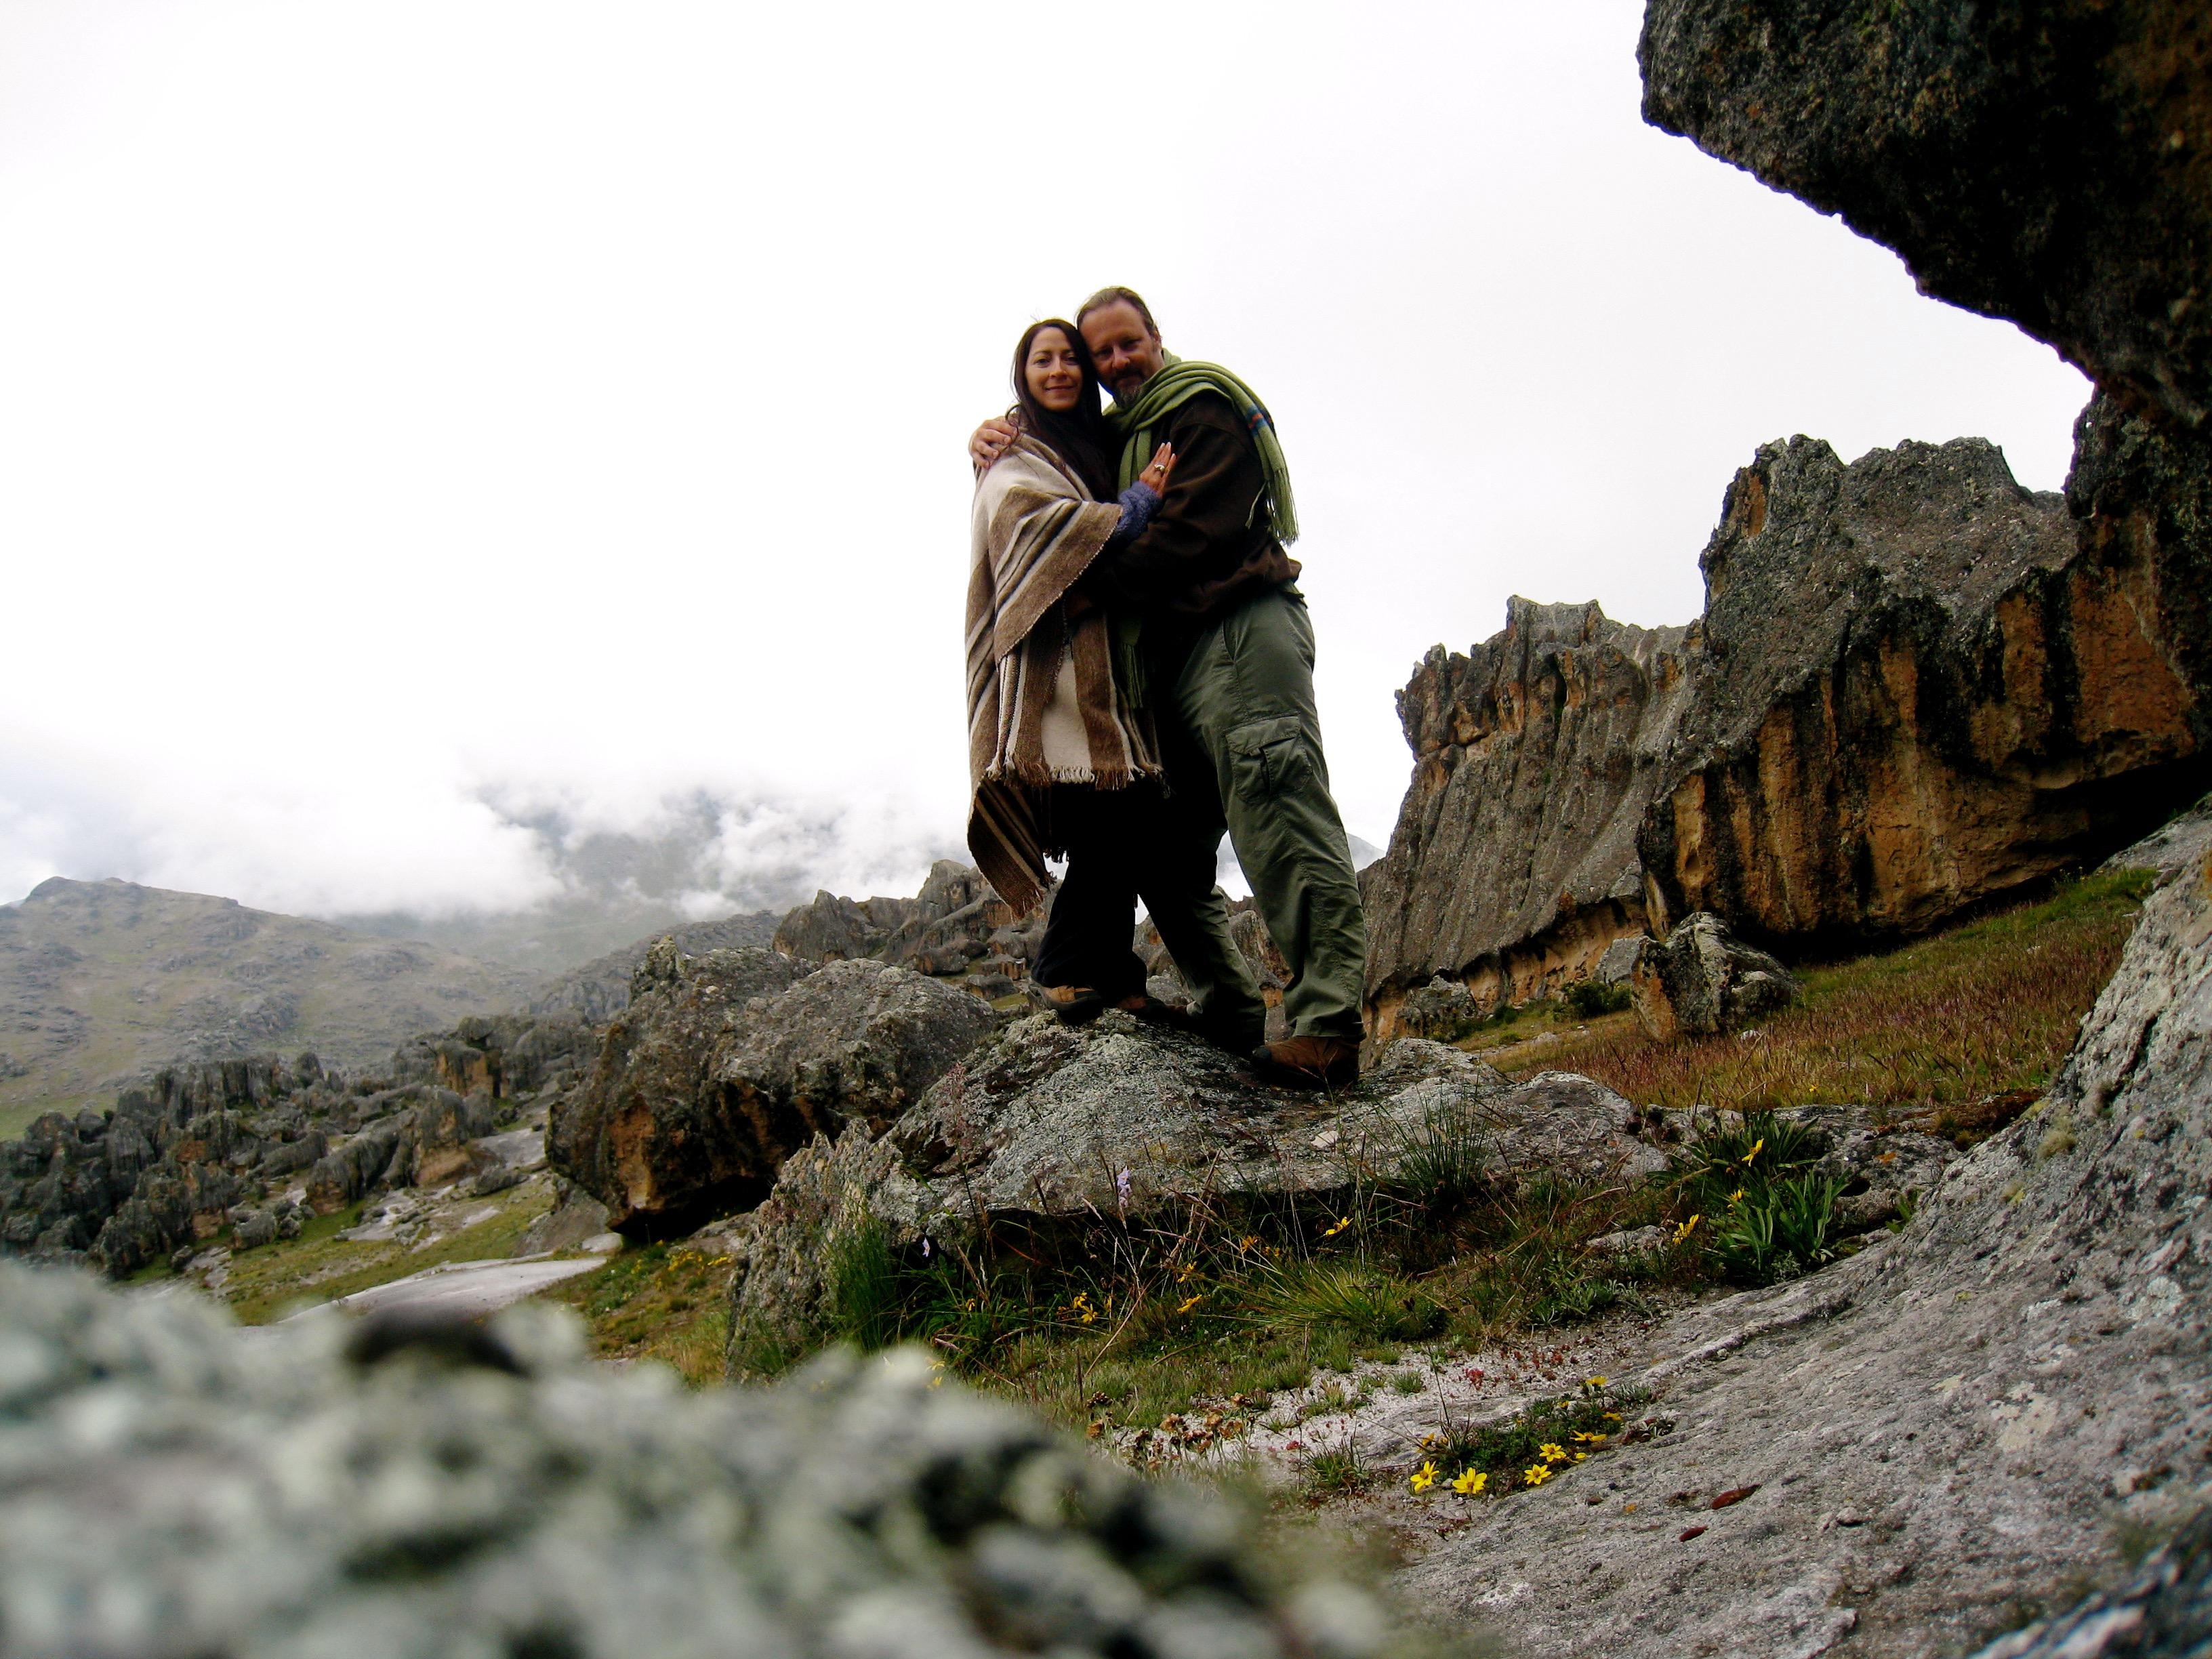 Osmunda & Darby on the rocks